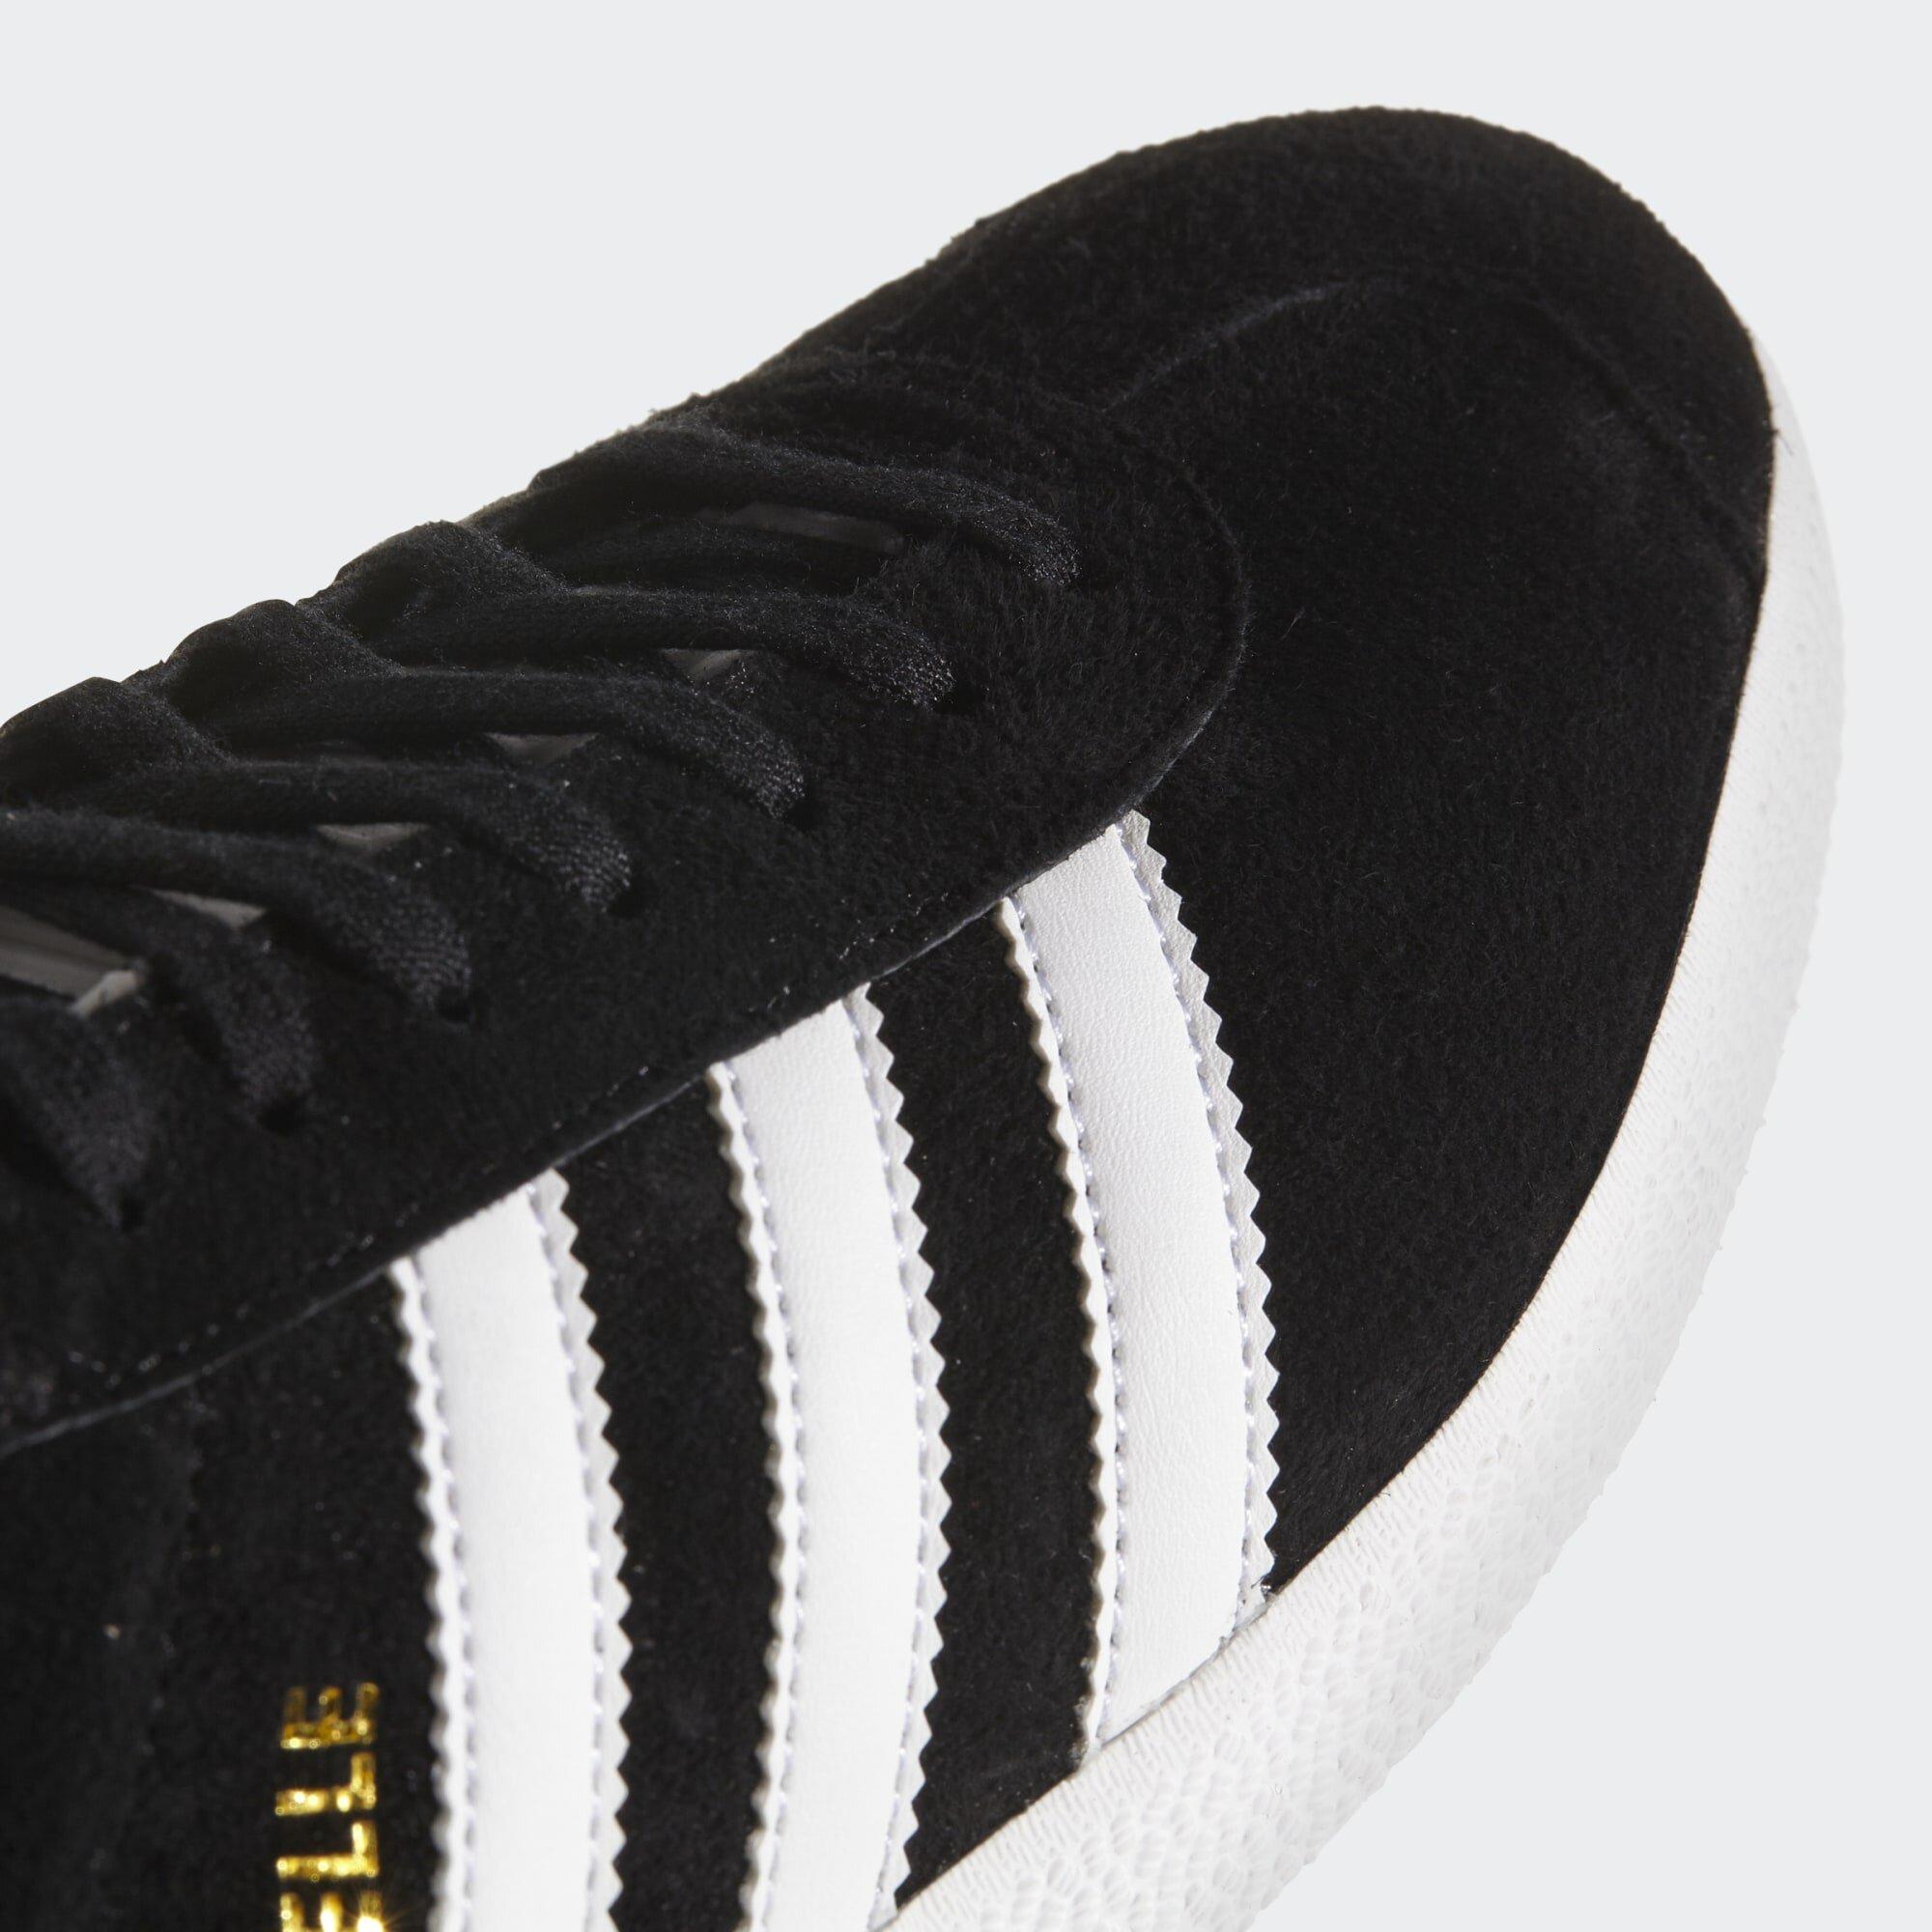 Adidas Gazelle in Core Black — MAJOR